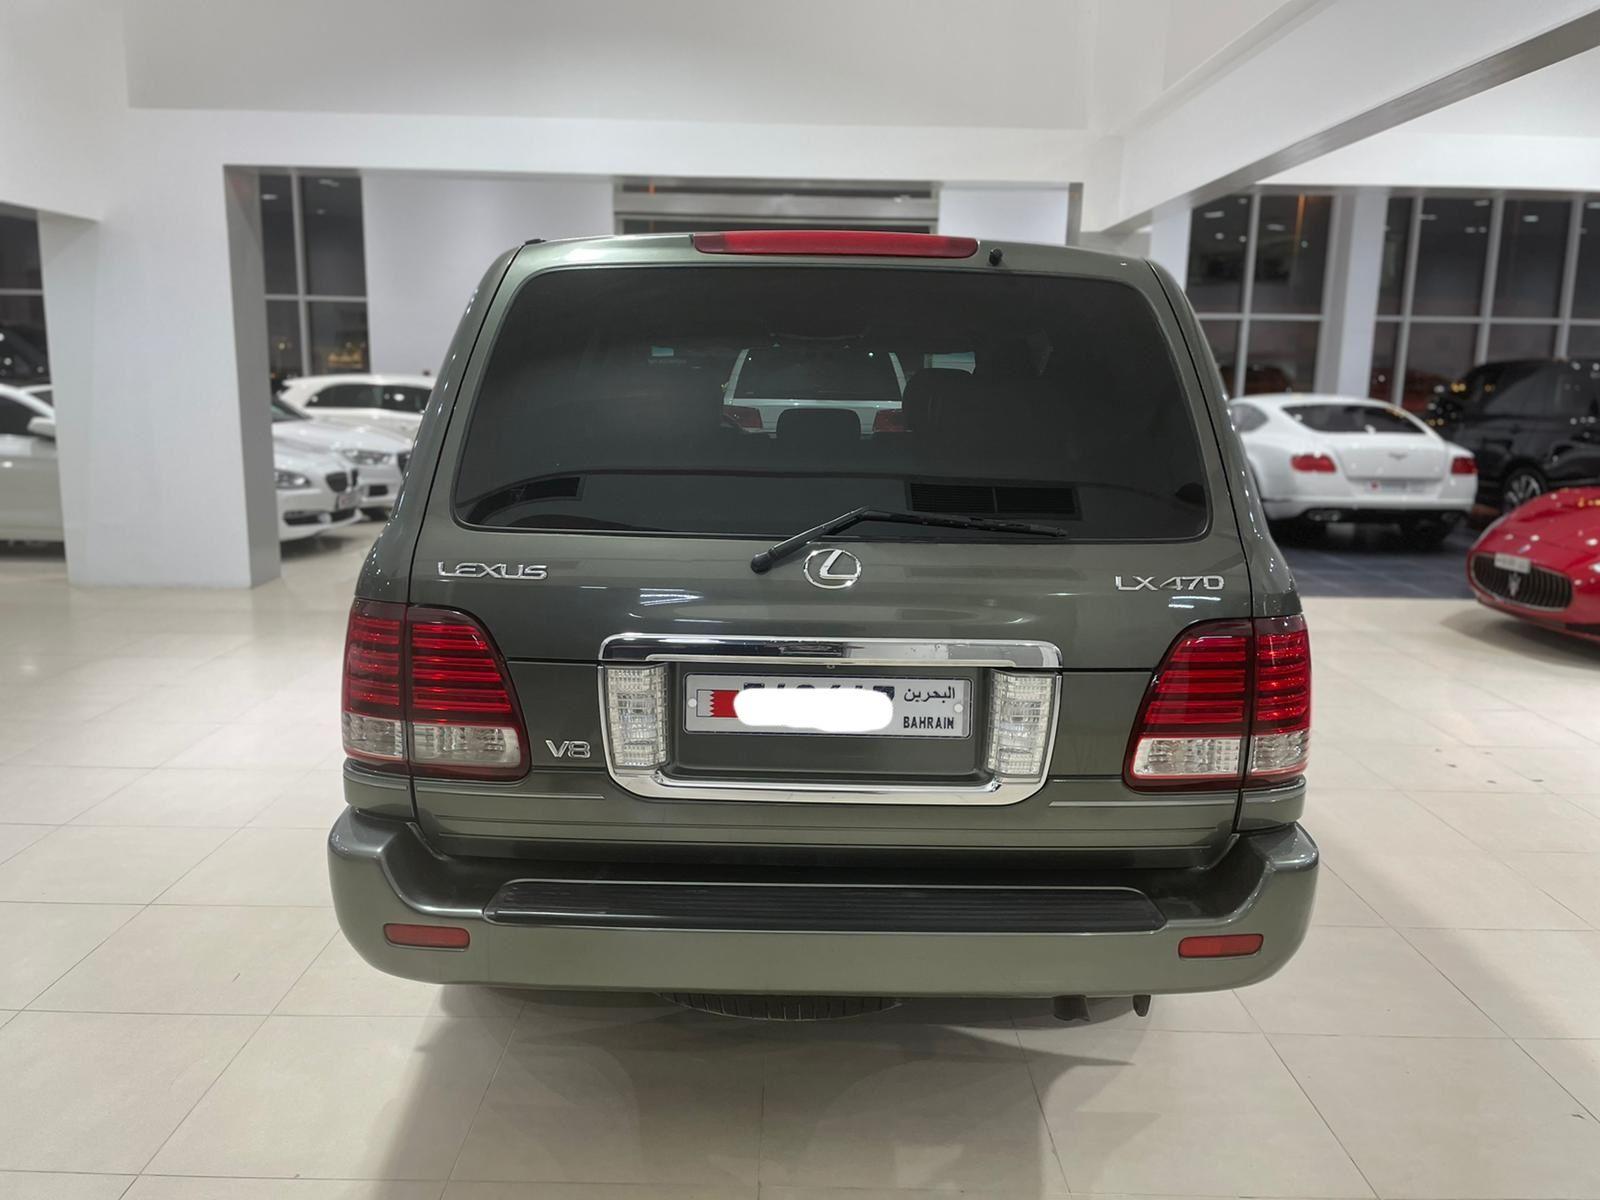 Lexus LX-470 / 2006 (Green)